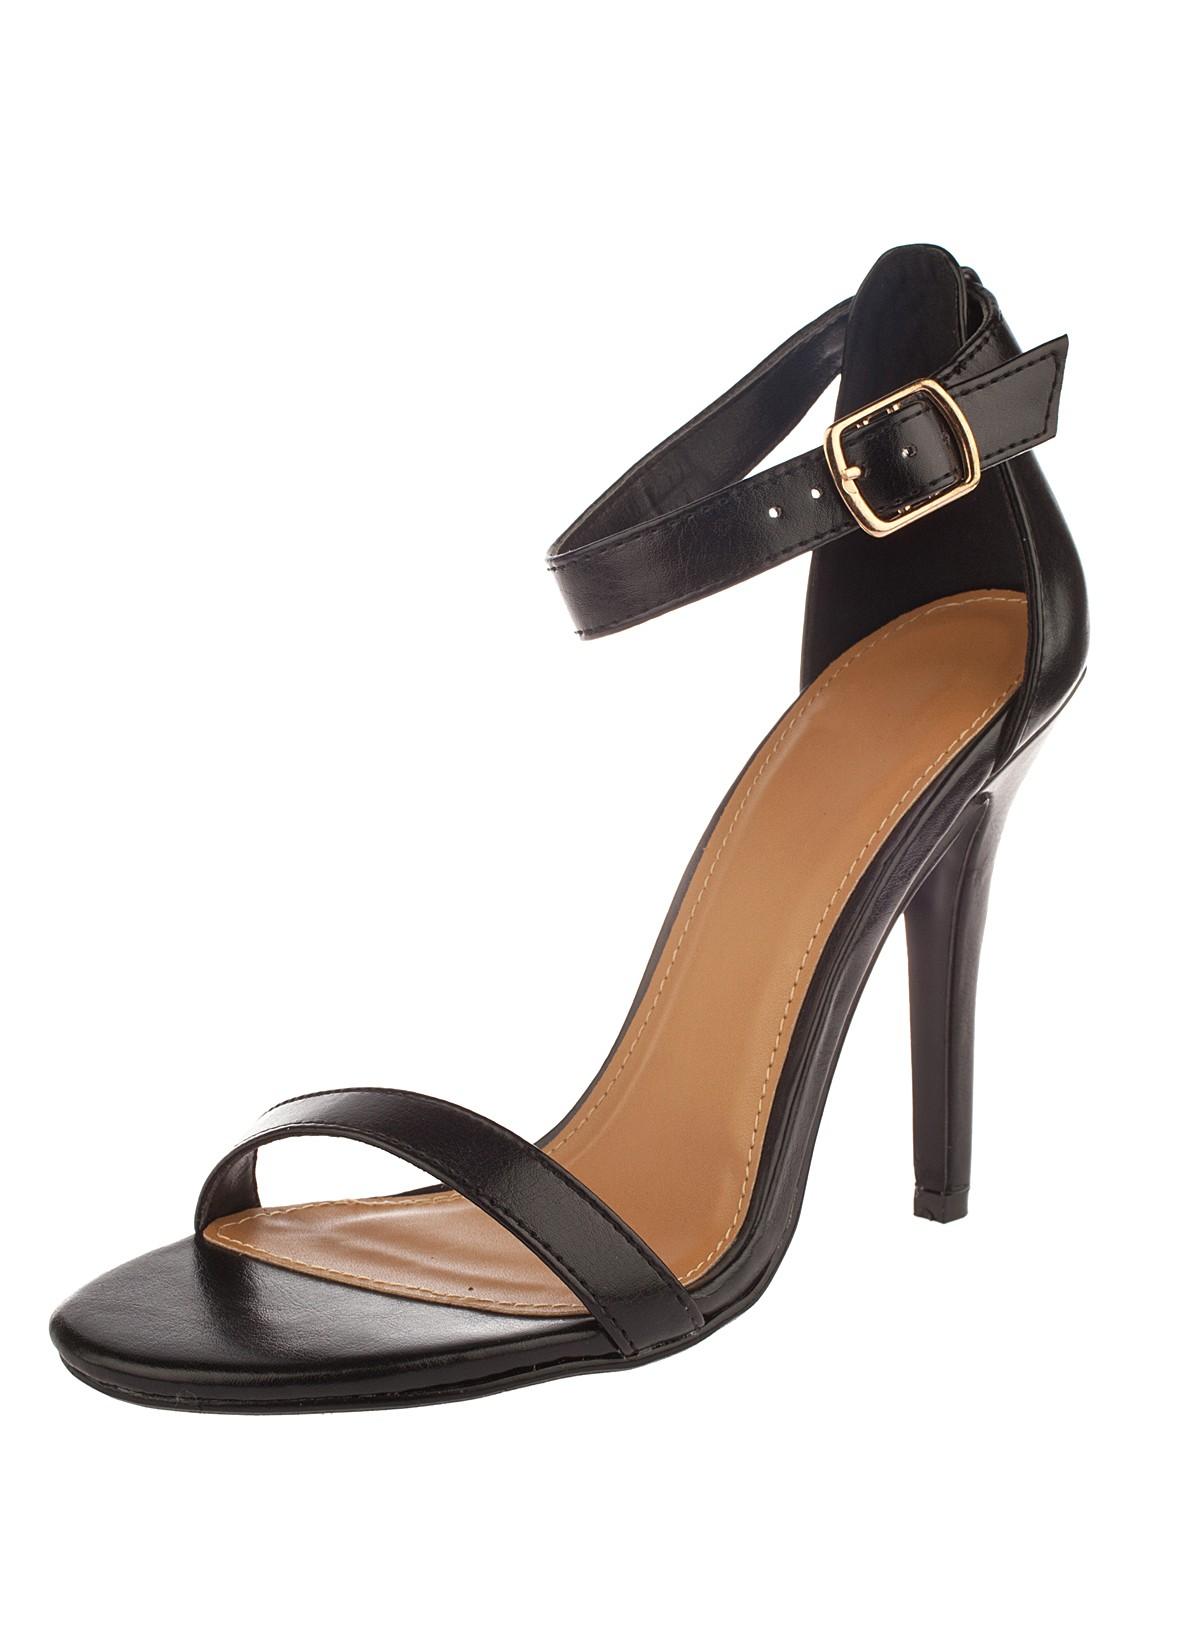 a6dd78243cff Sashay Ankle Strap Sandals Black at Prima donna